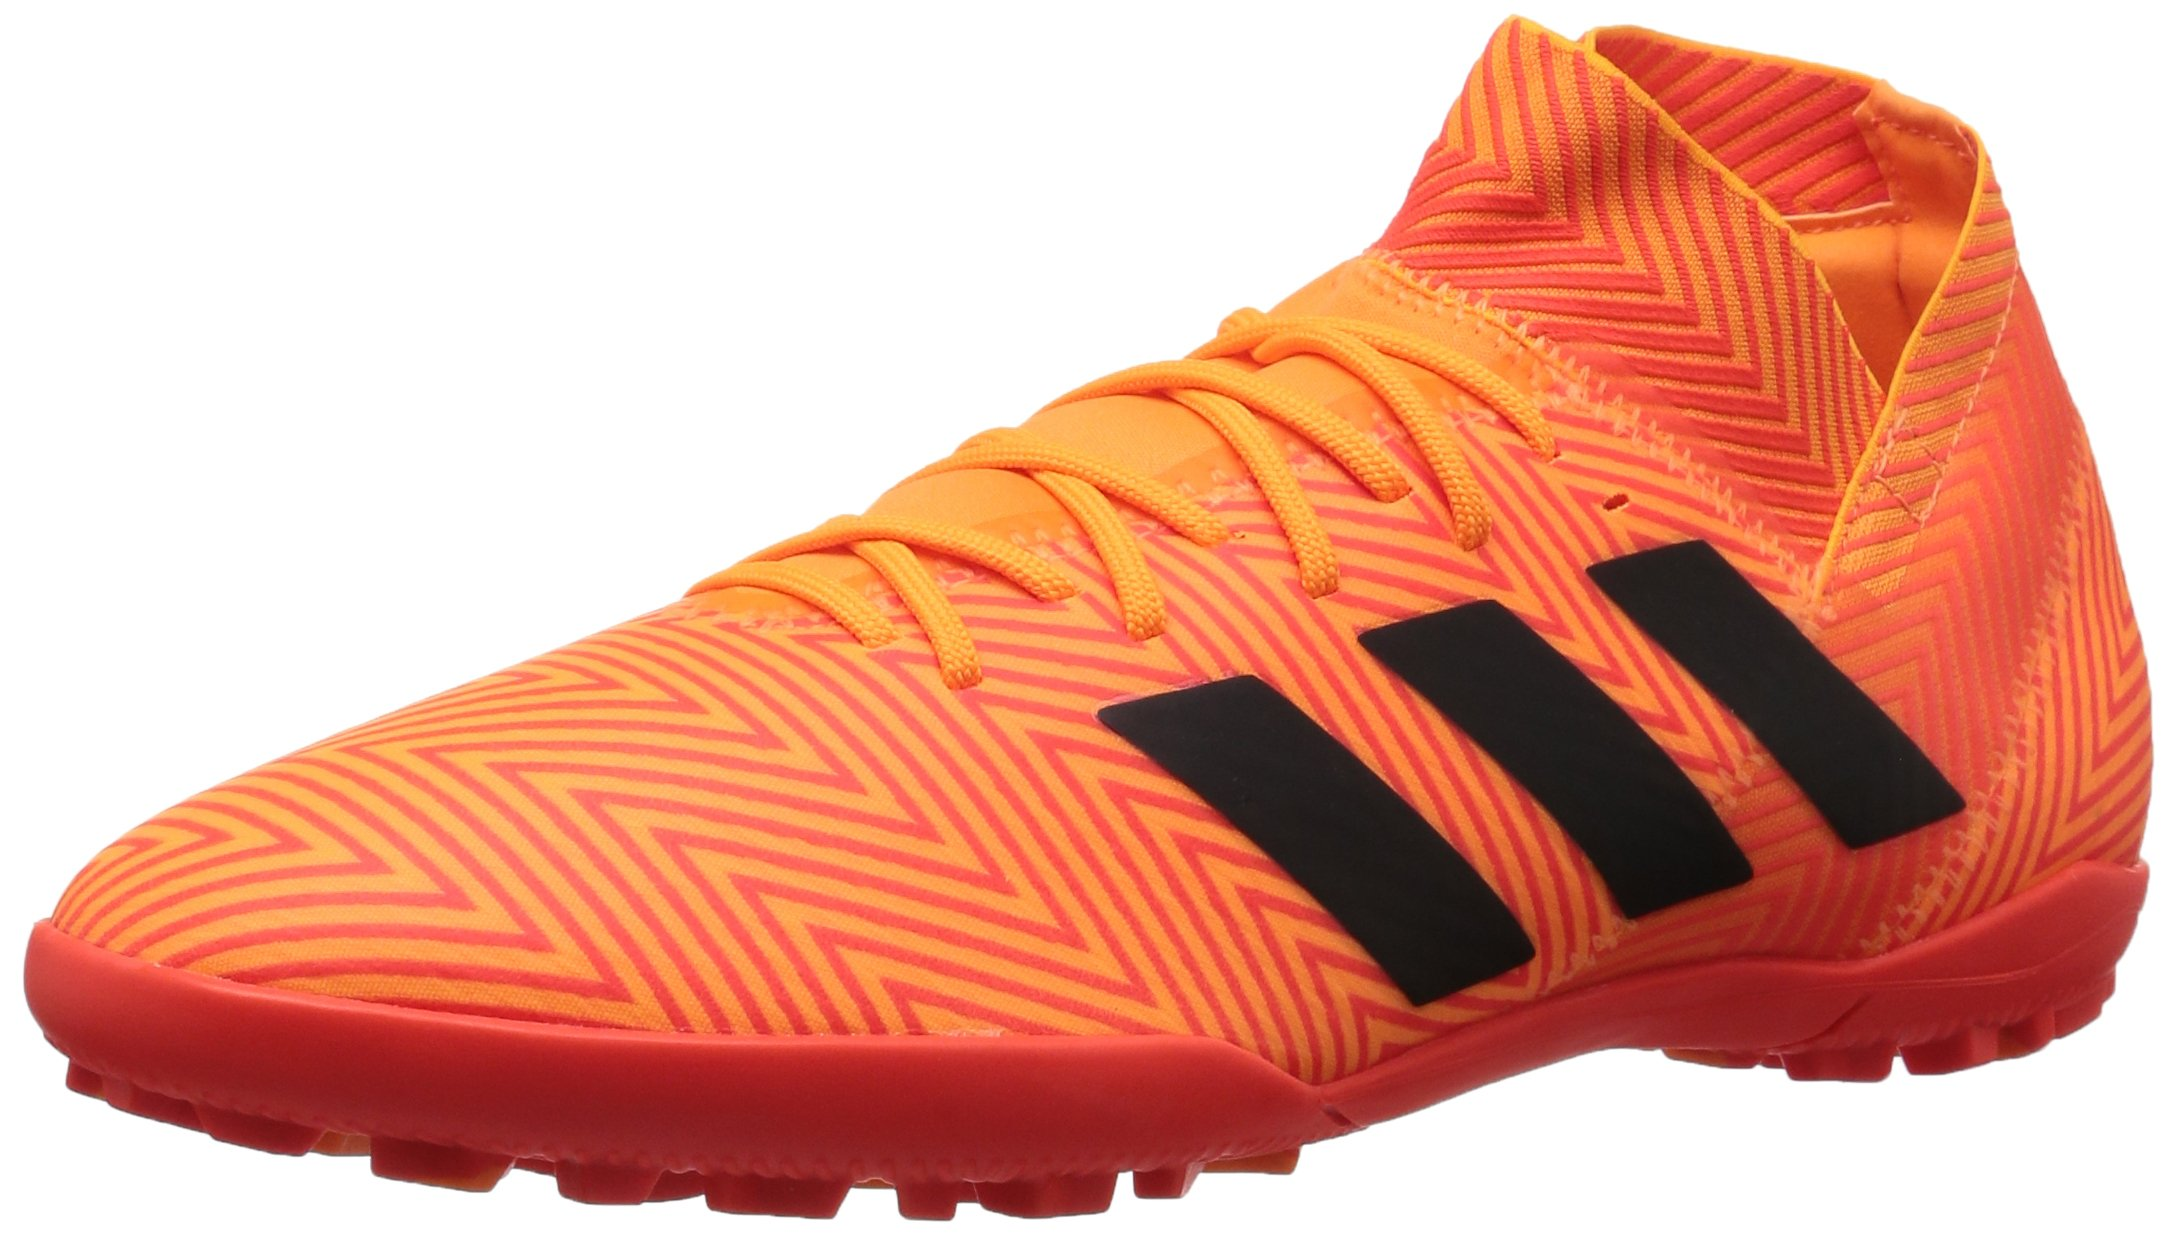 adidas Men's Nemeziz Tango 18.3 Turf Soccer Shoe, Zest/Black/Solar Red, 10 M US by adidas